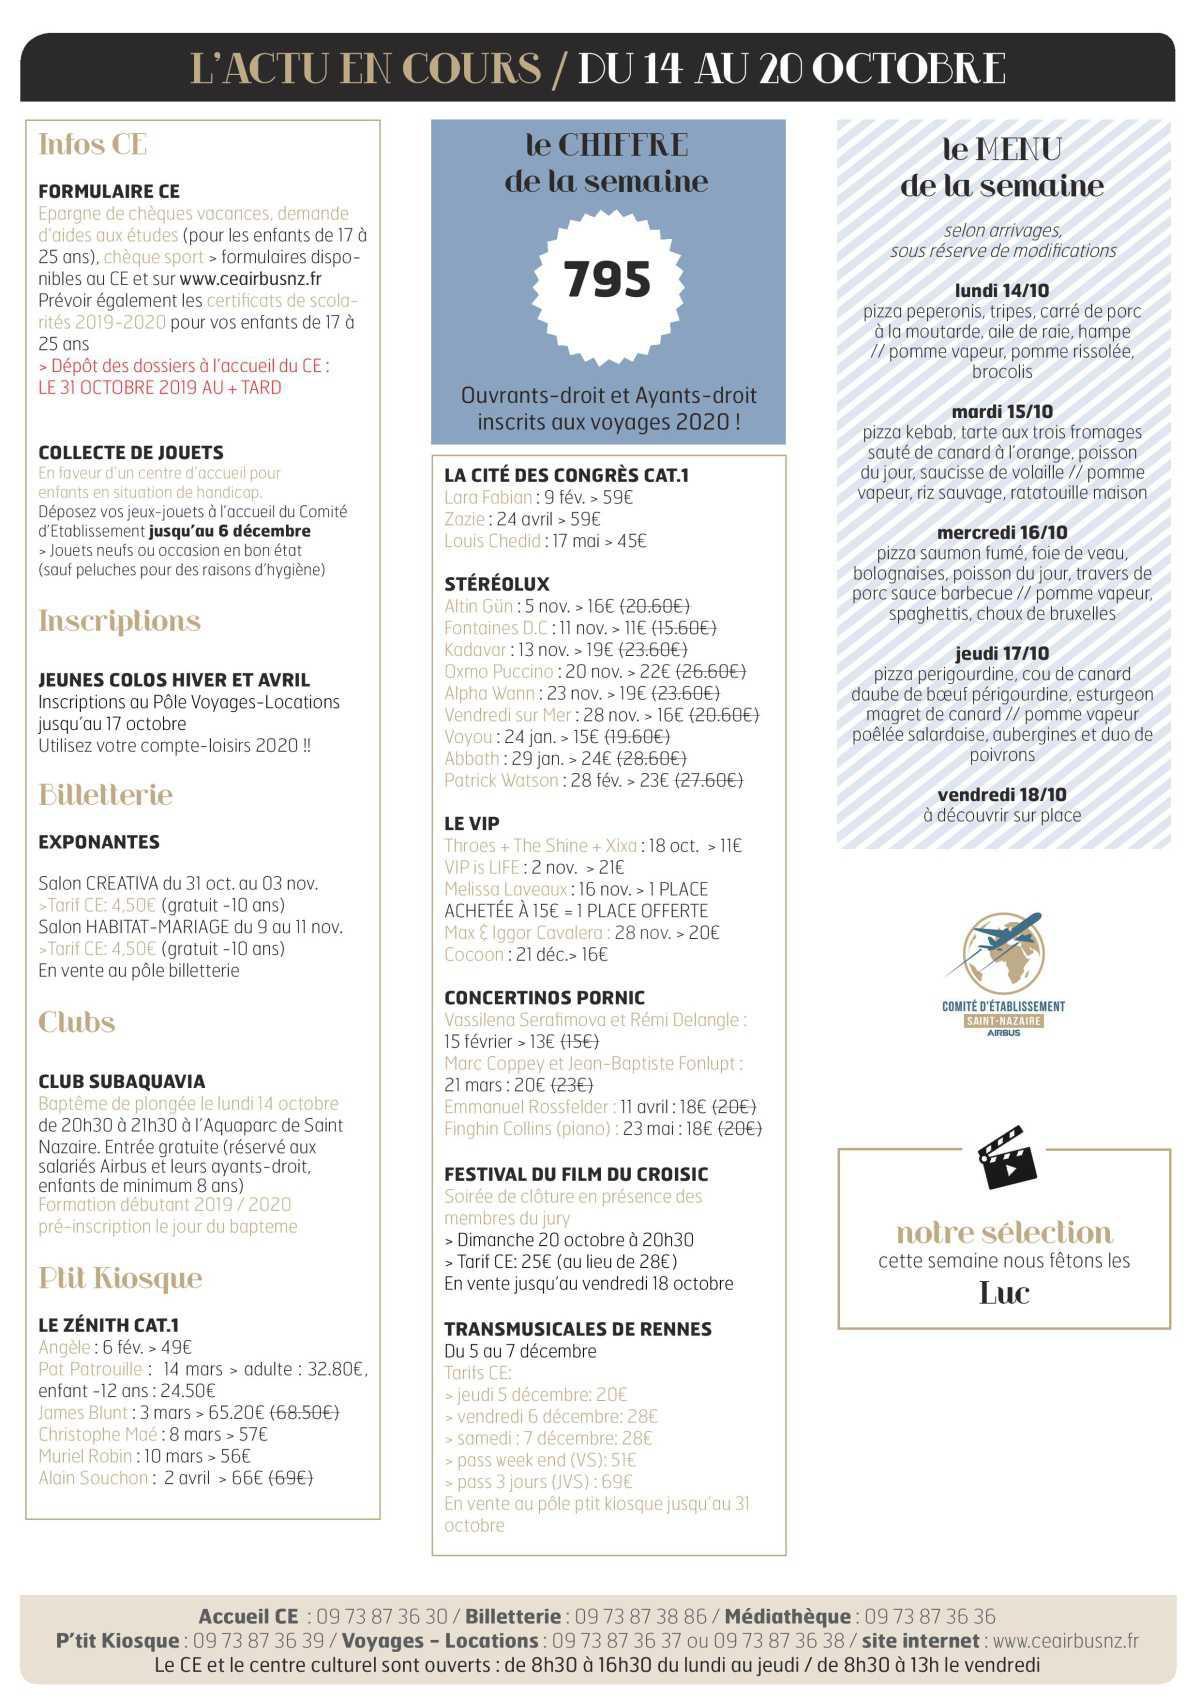 Infos CE / COOP semaine 42